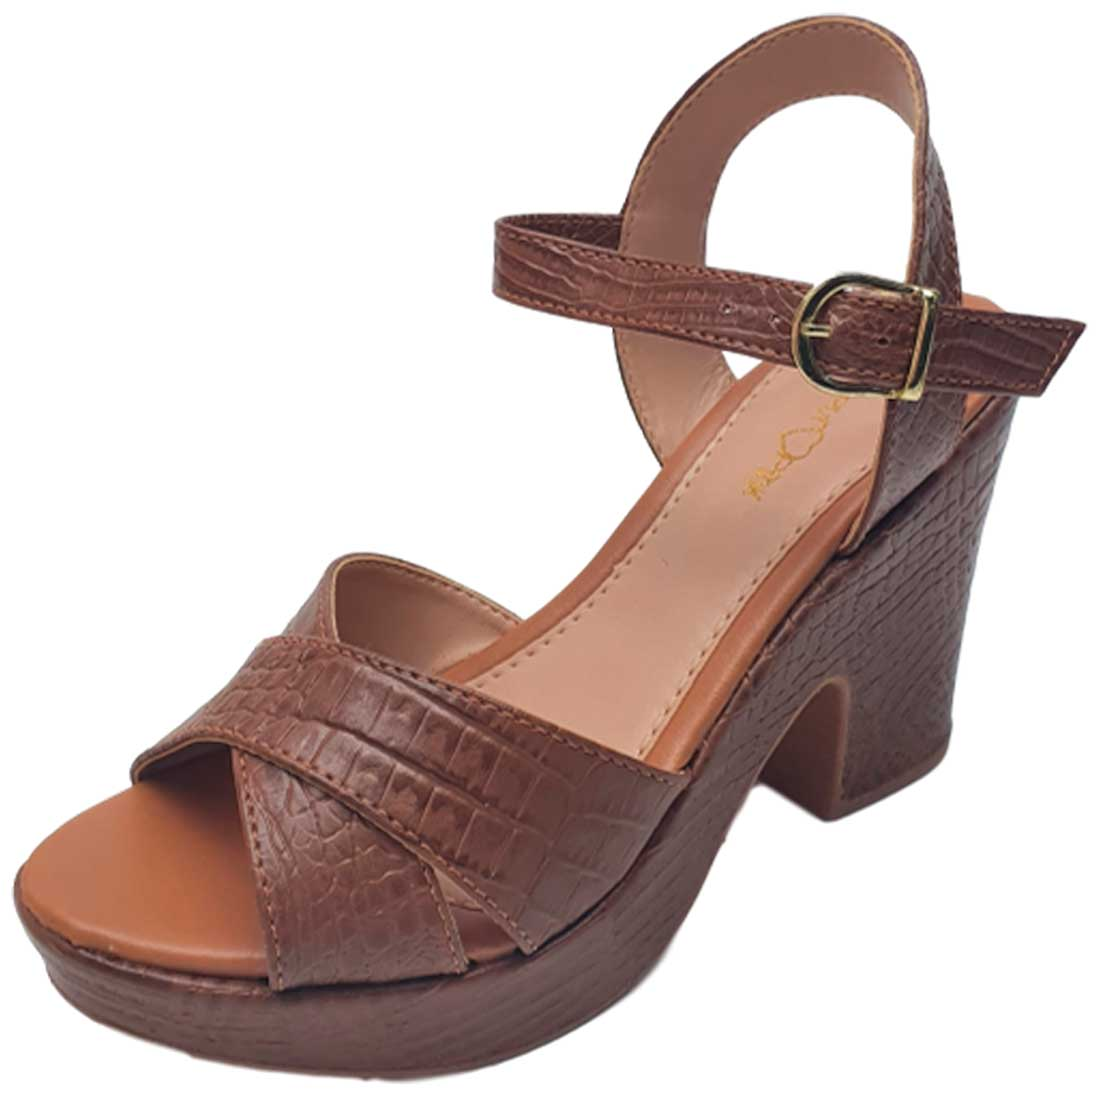 Sandália Plataforma Croco - Caramelo